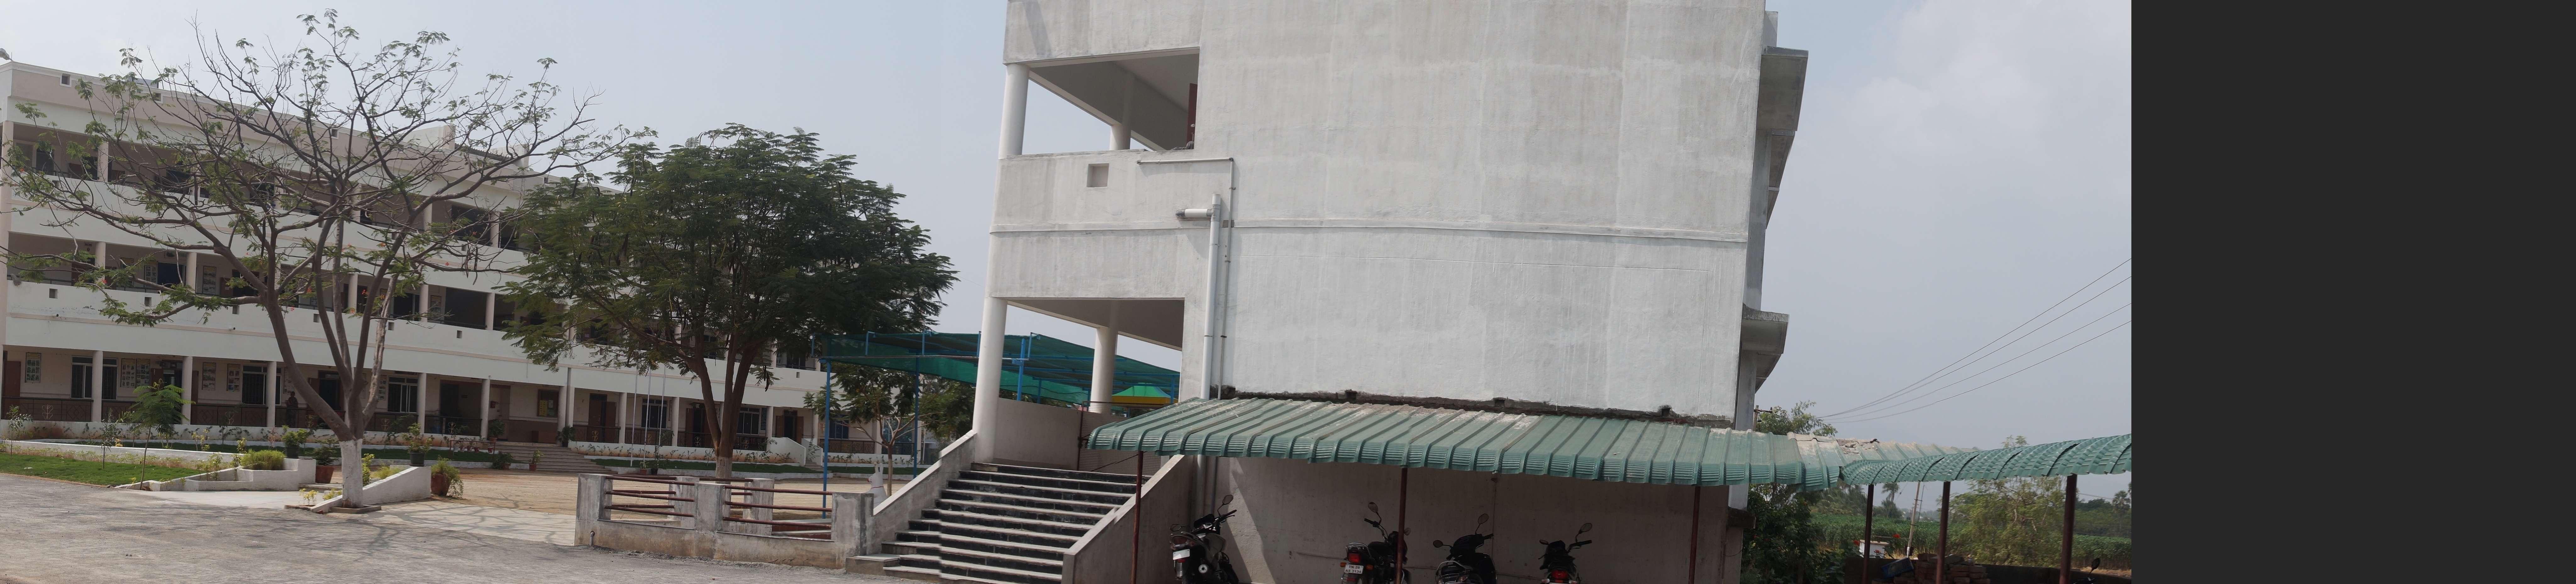 SHRI VIDHYA BHARATHI MODERN SCHOOL 2 93 1 Near Senthil Nagar Mettukadu Pattanam Post Rasipuram Taluk Namakkal Dist TamilNadu 1930345